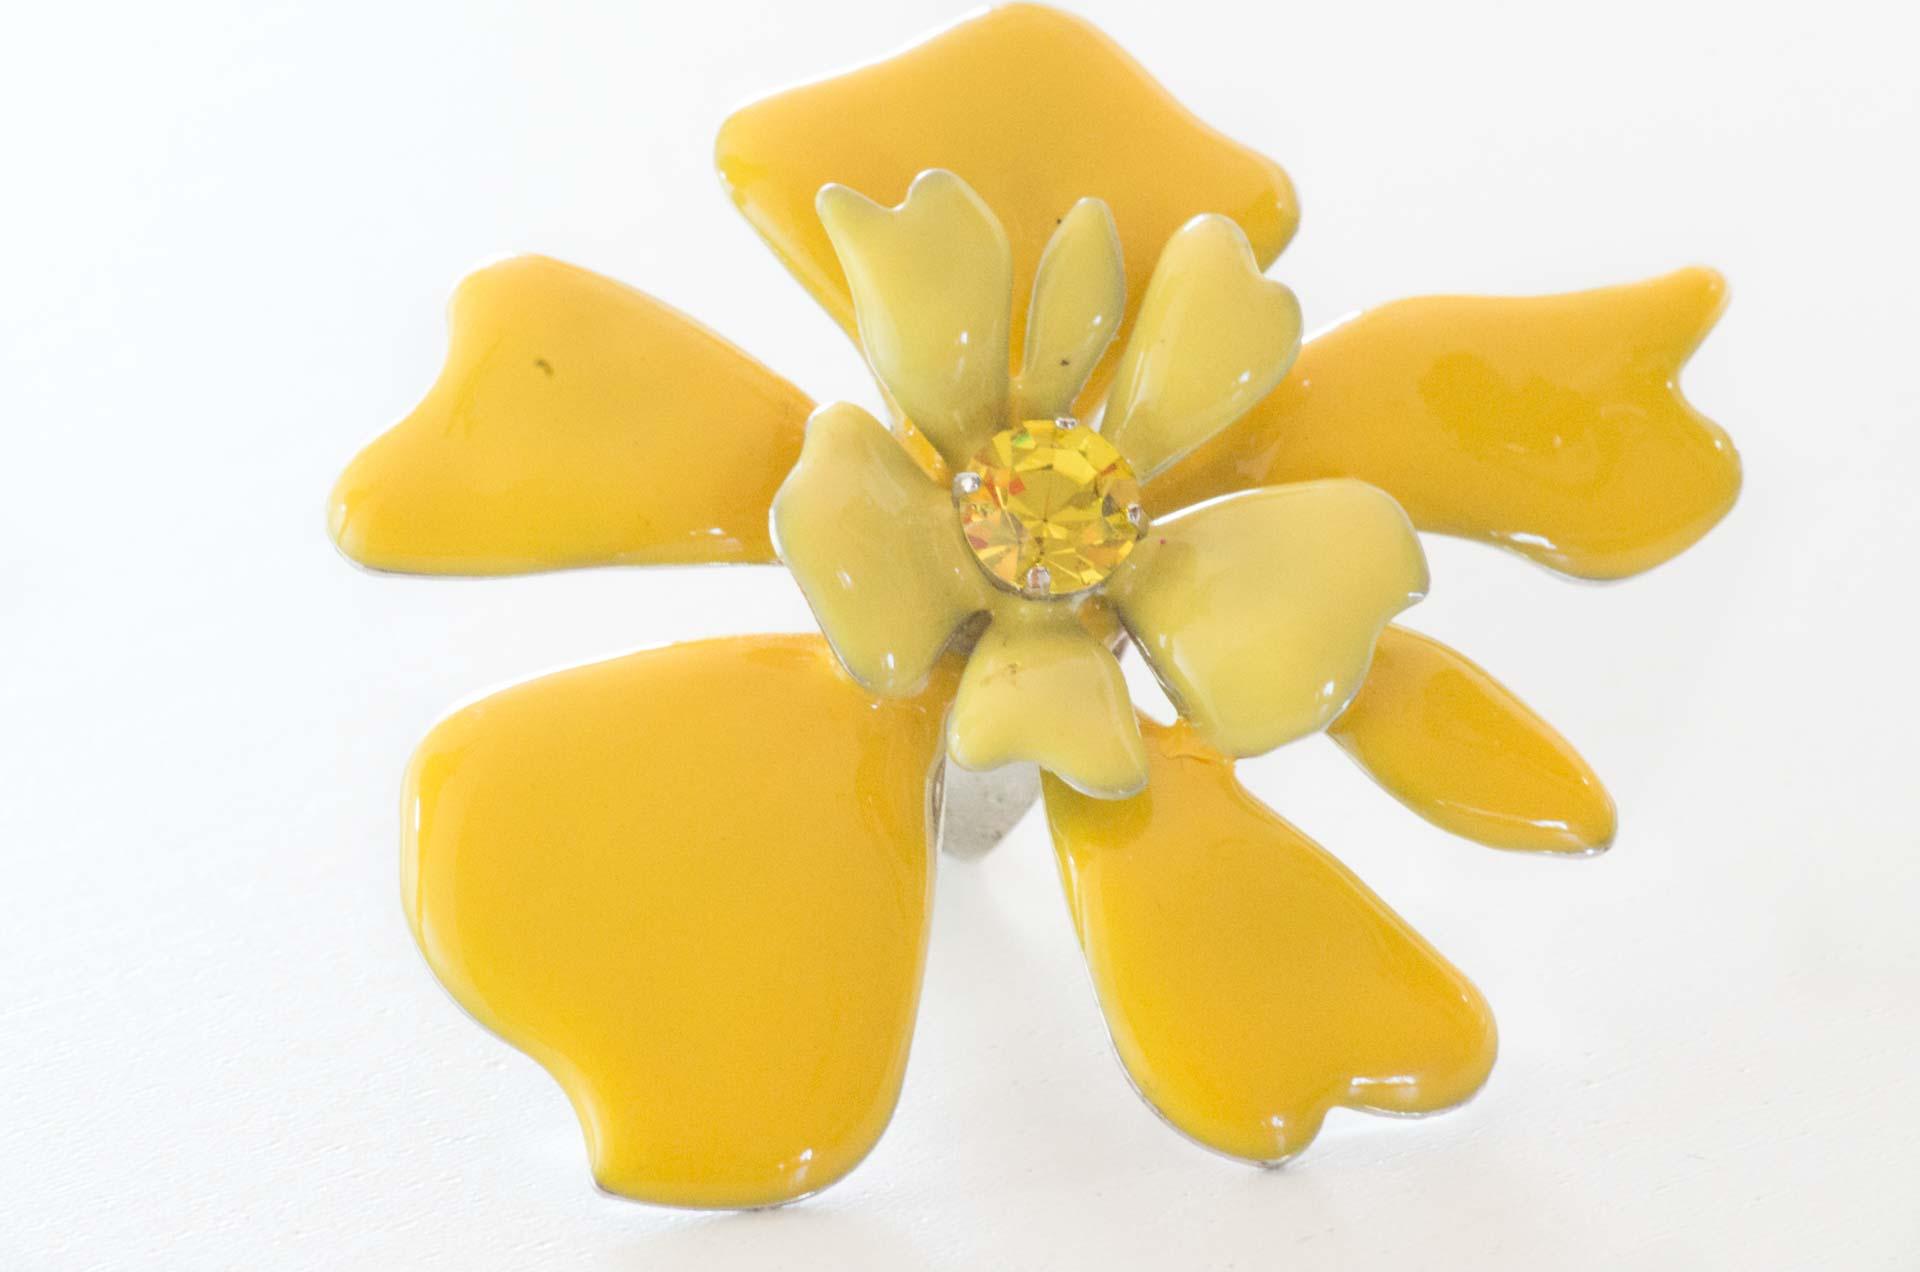 anello in smalto giallo 4